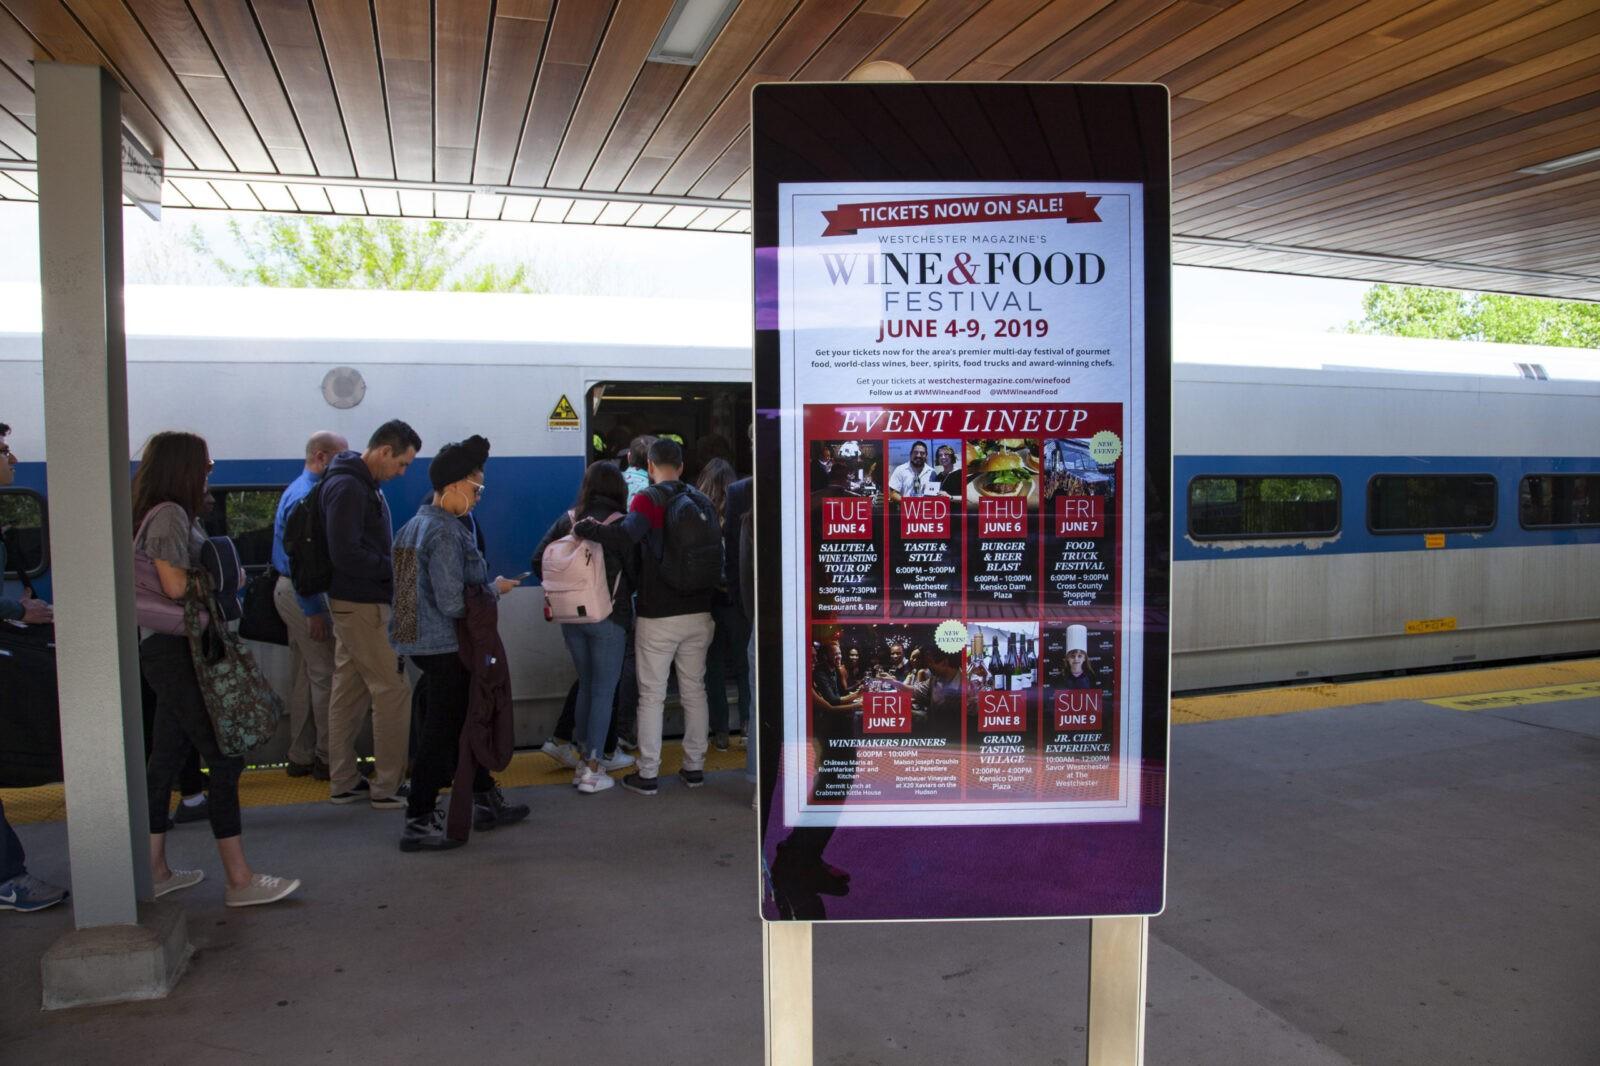 Westchester Wine & Food Festival Digital Rail Platform Advertising